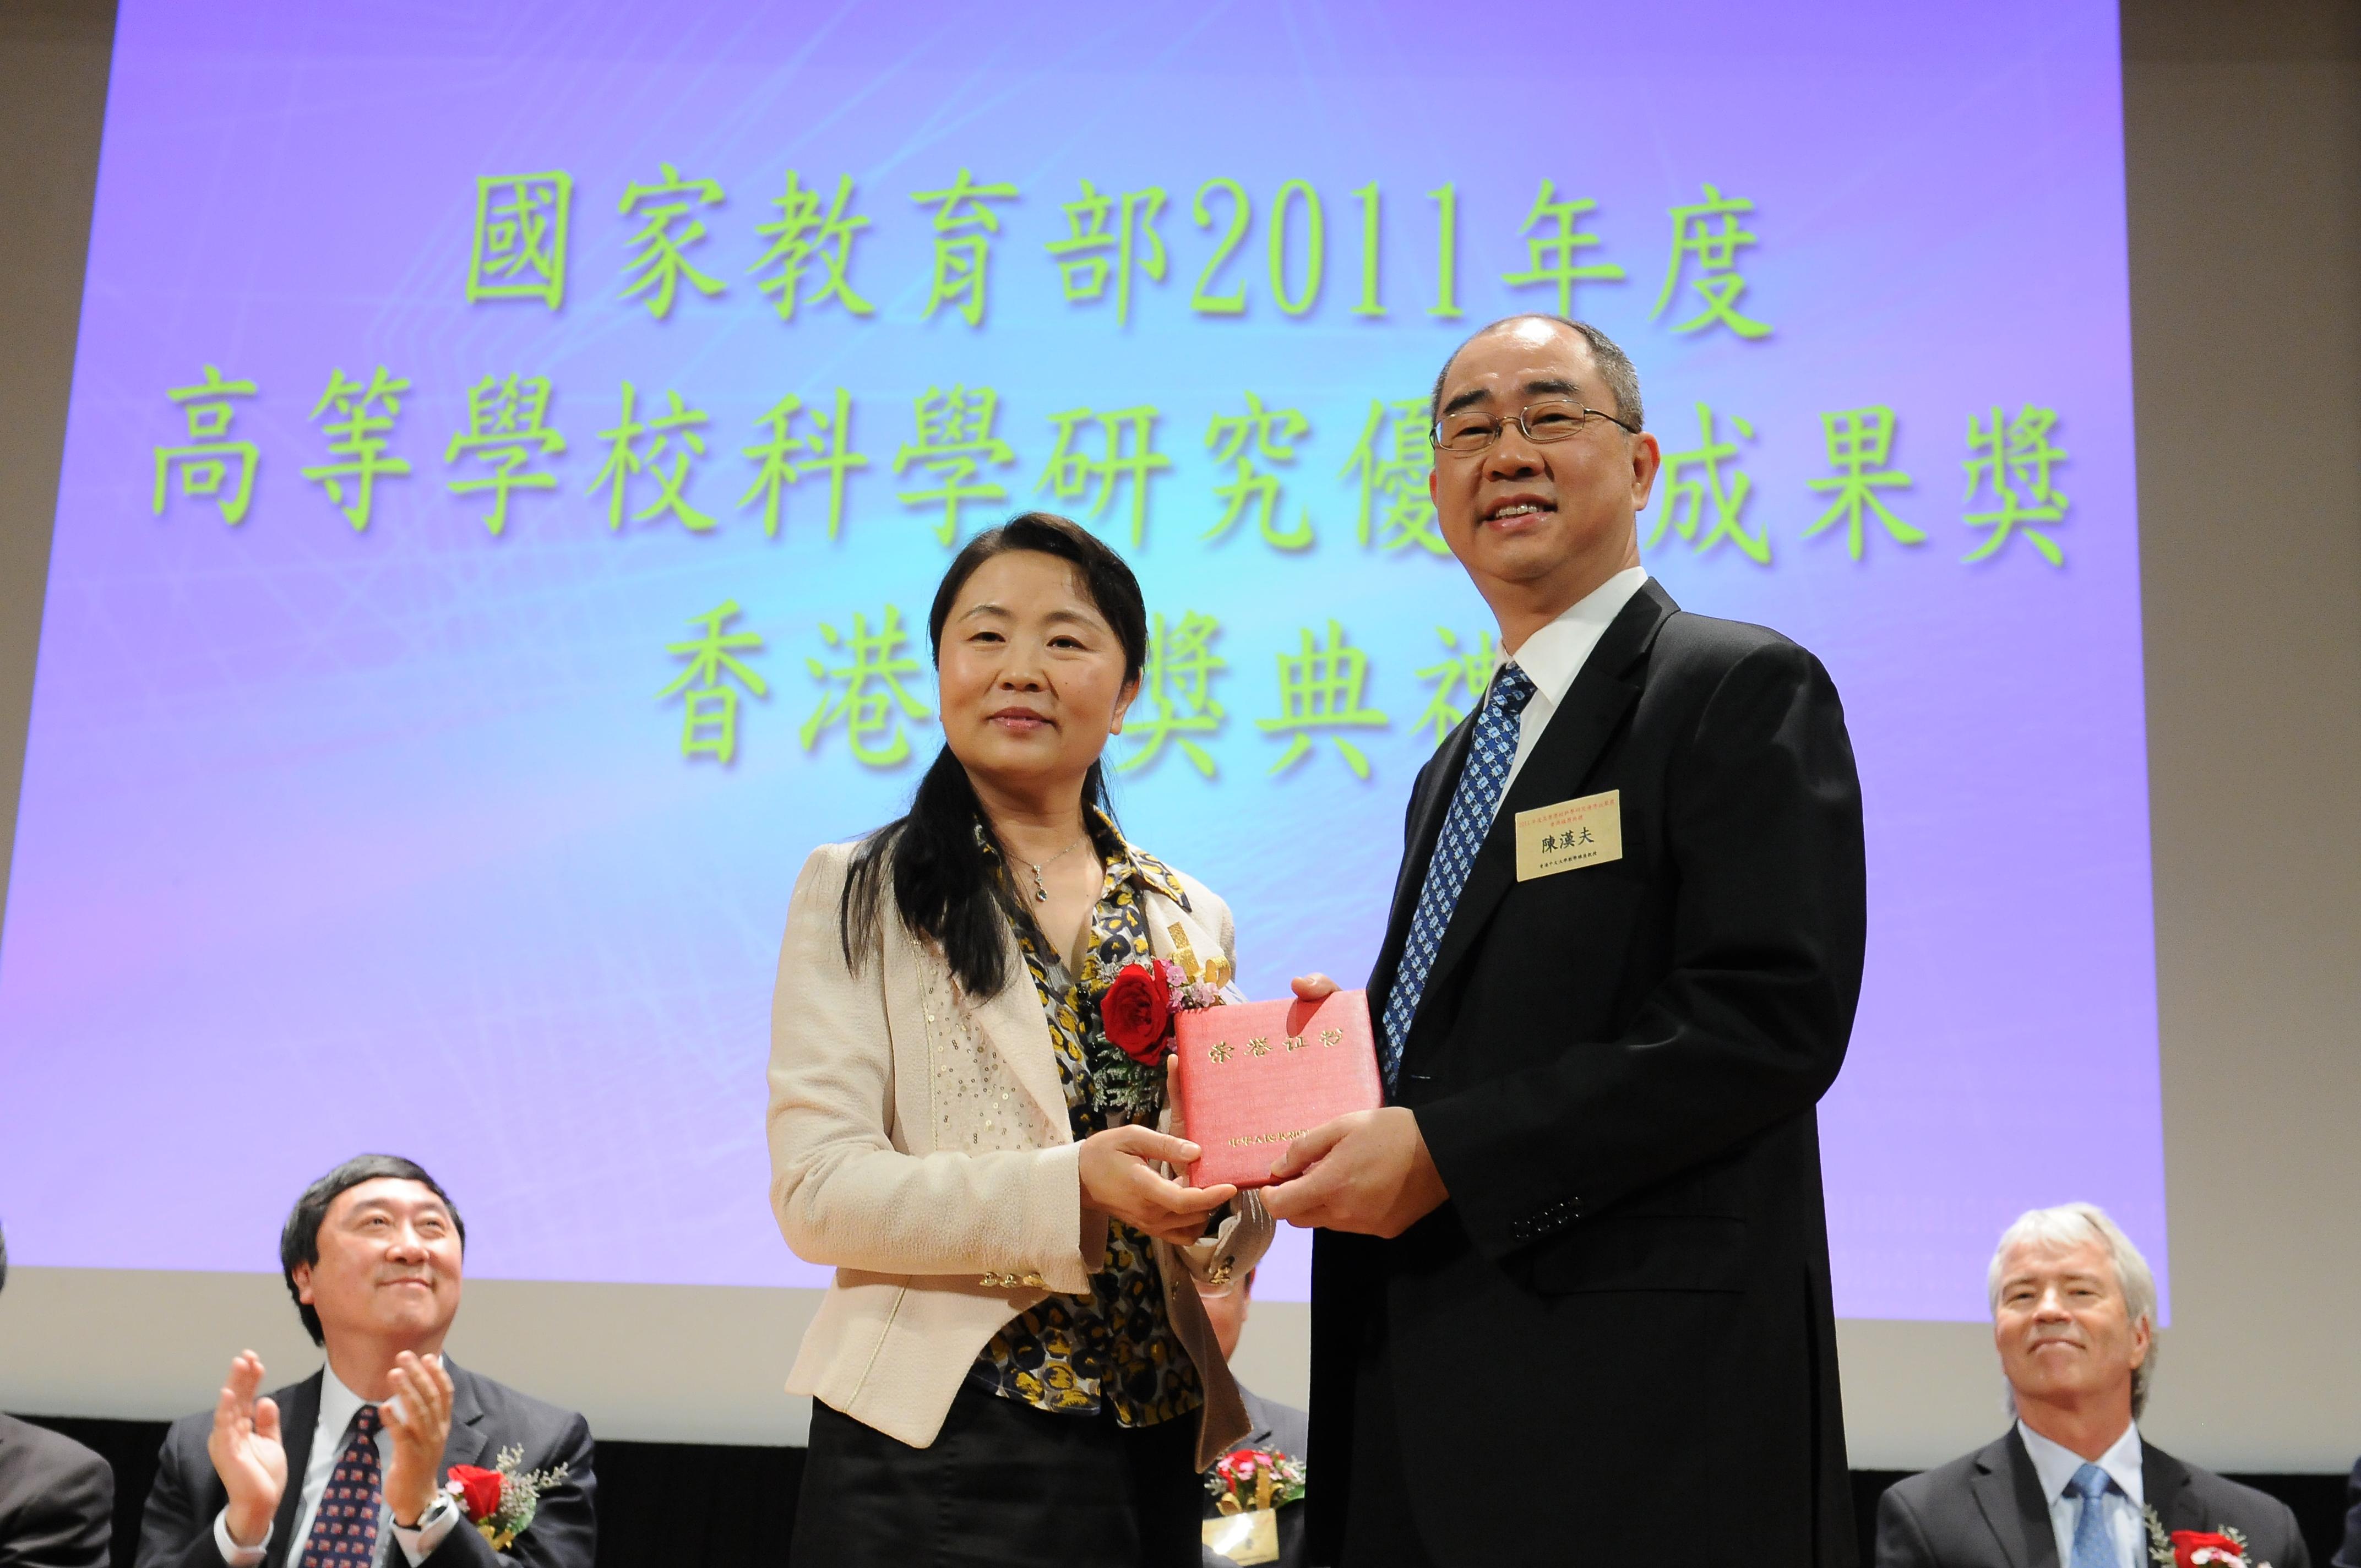 Prof. Chan Hon-fu Raymond, Professor, Department of Mathematics, CUHK, receives his award certificate from Dr. Zhou Jing.